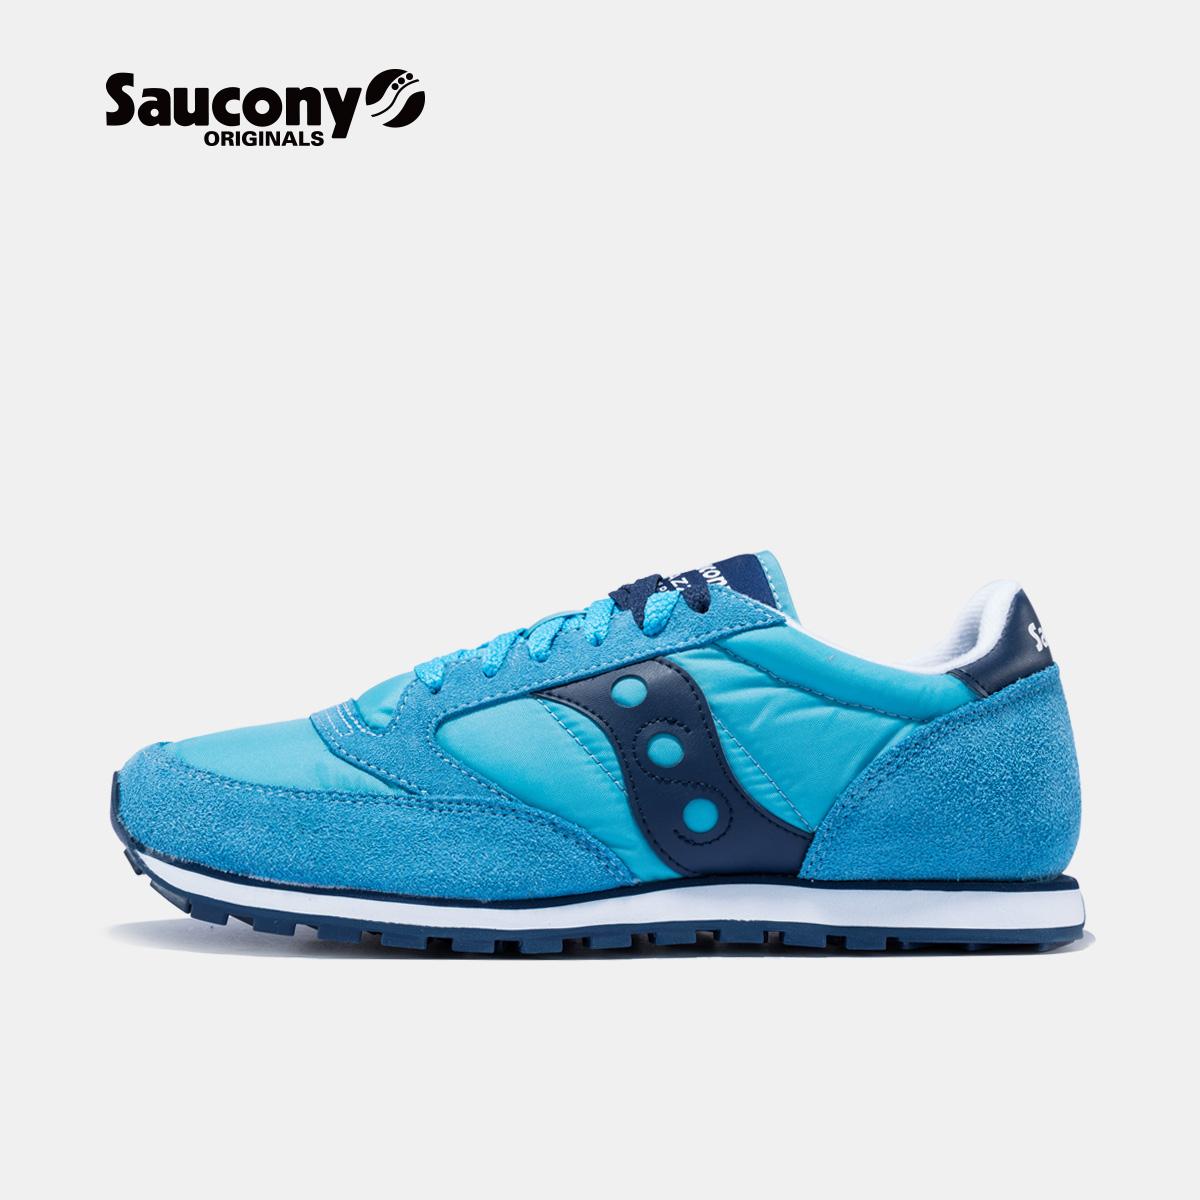 Saucony圣康尼 JAZZ LOW复古跑鞋板鞋男跑步休闲运动鞋S2866-191